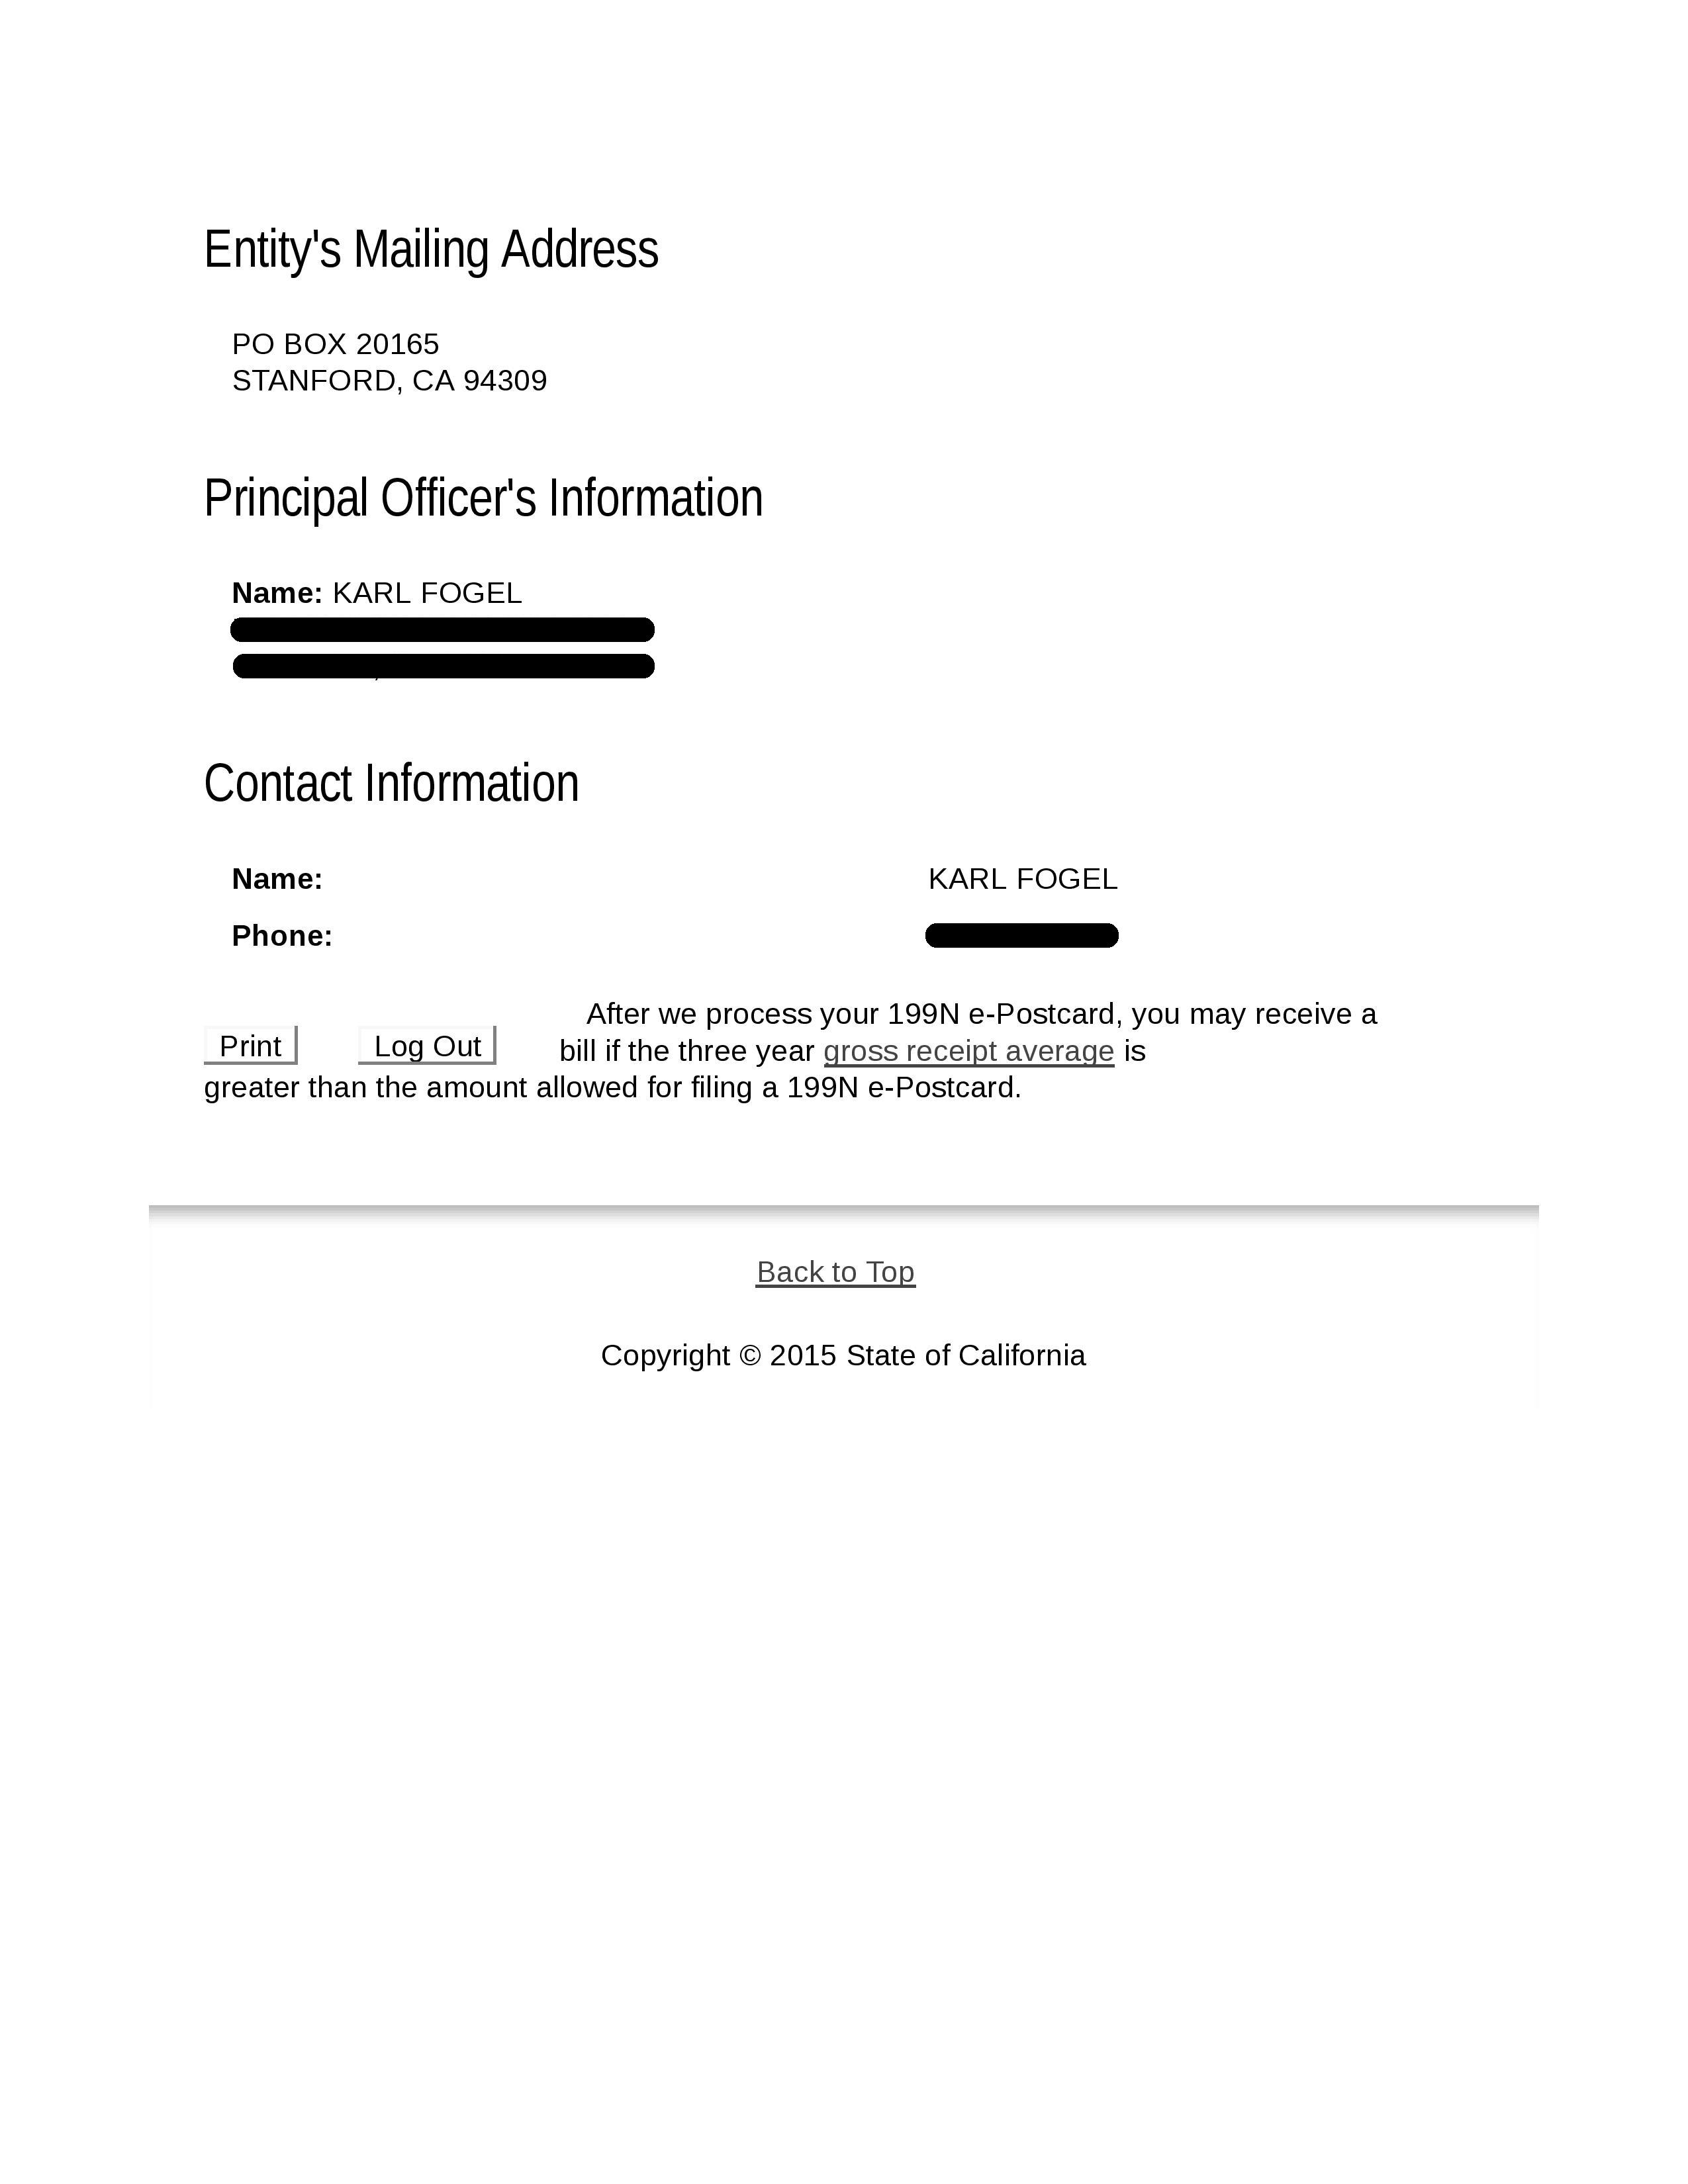 Corporate Documents, Tax Returns, Etc.   QuestionCopyright.org